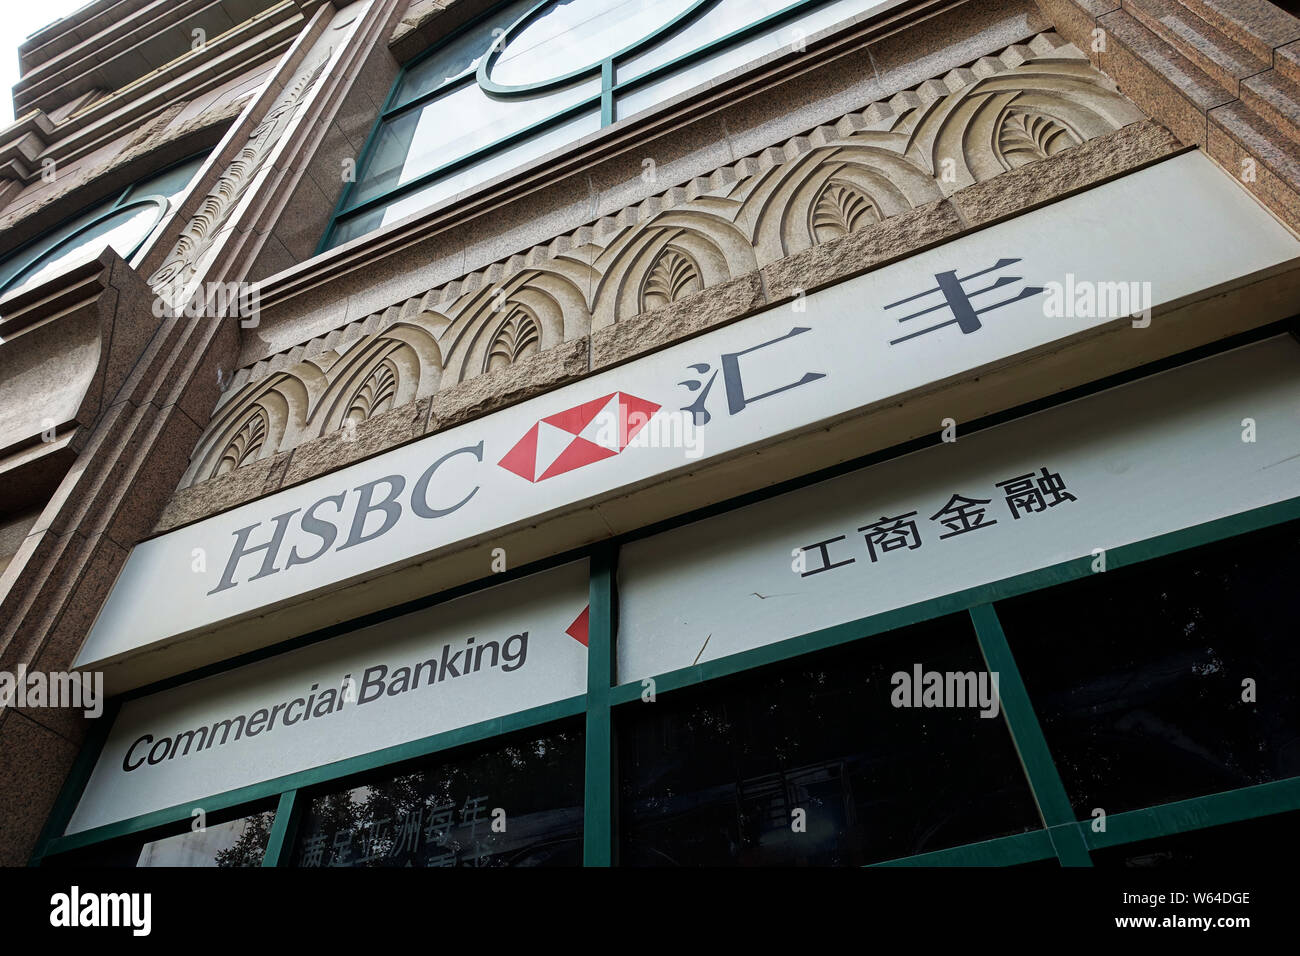 FILE--View of a branch of HSBC (the Hongkong and Shanghai Banking